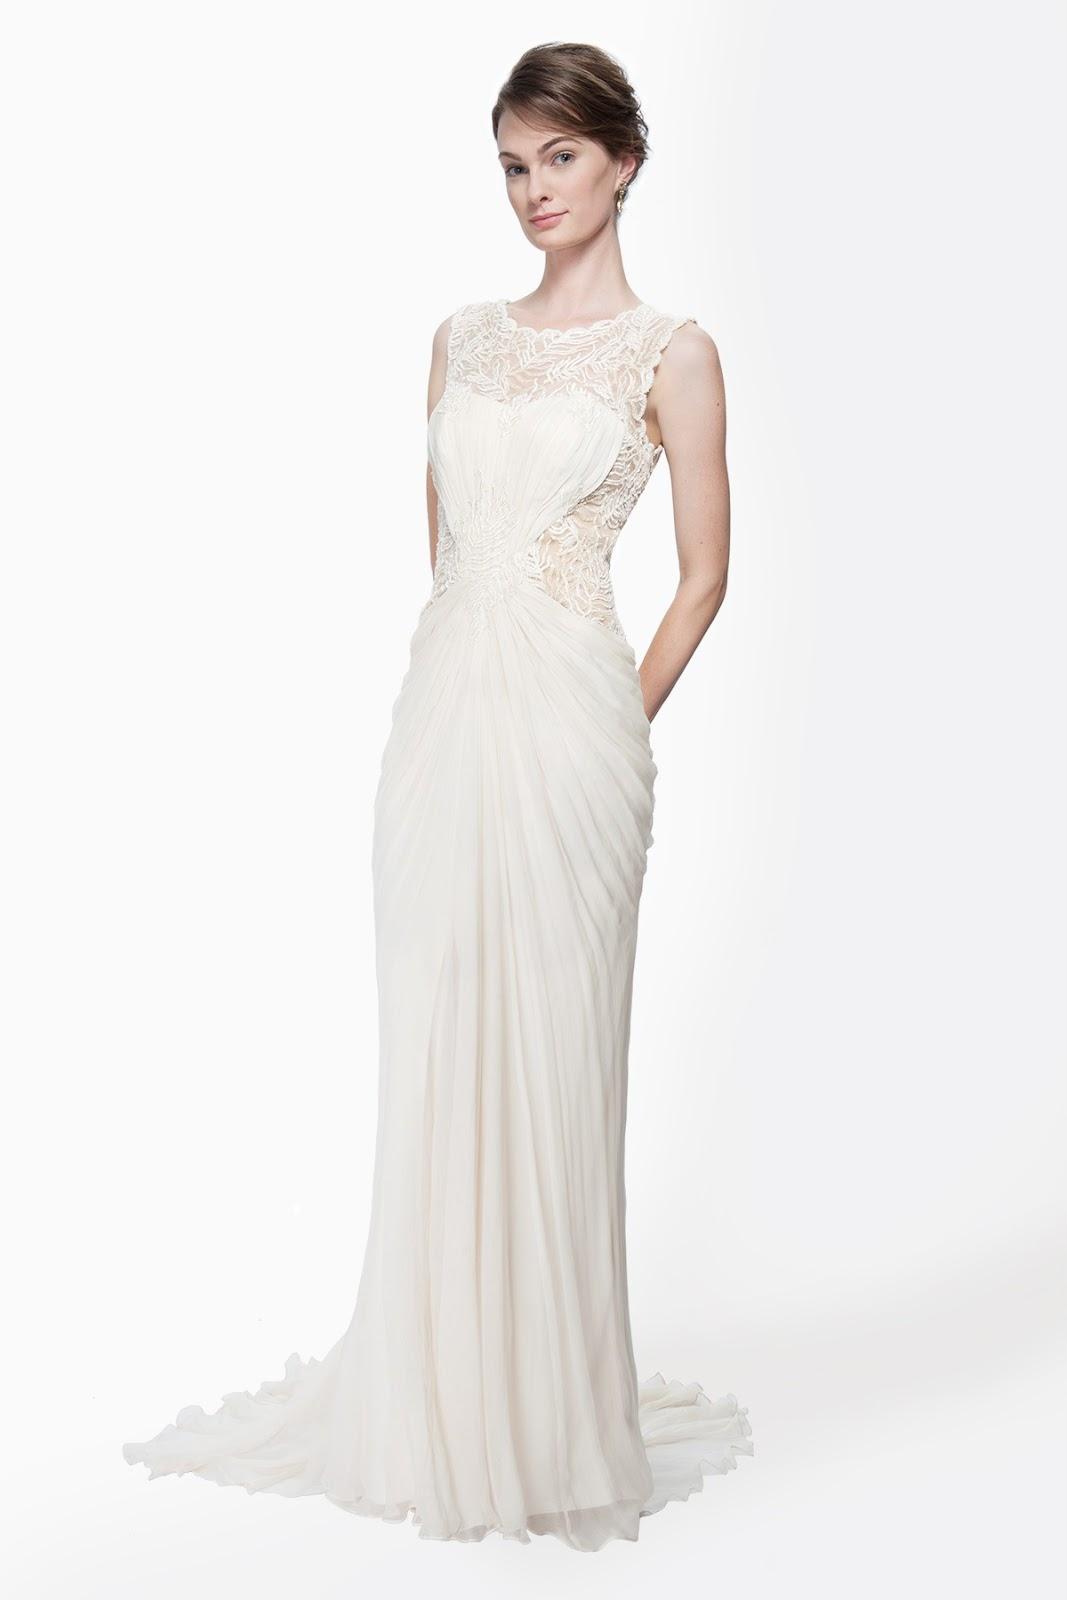 The bride loves fashion alternative wedding dresses for Tadashi shoji wedding dresses